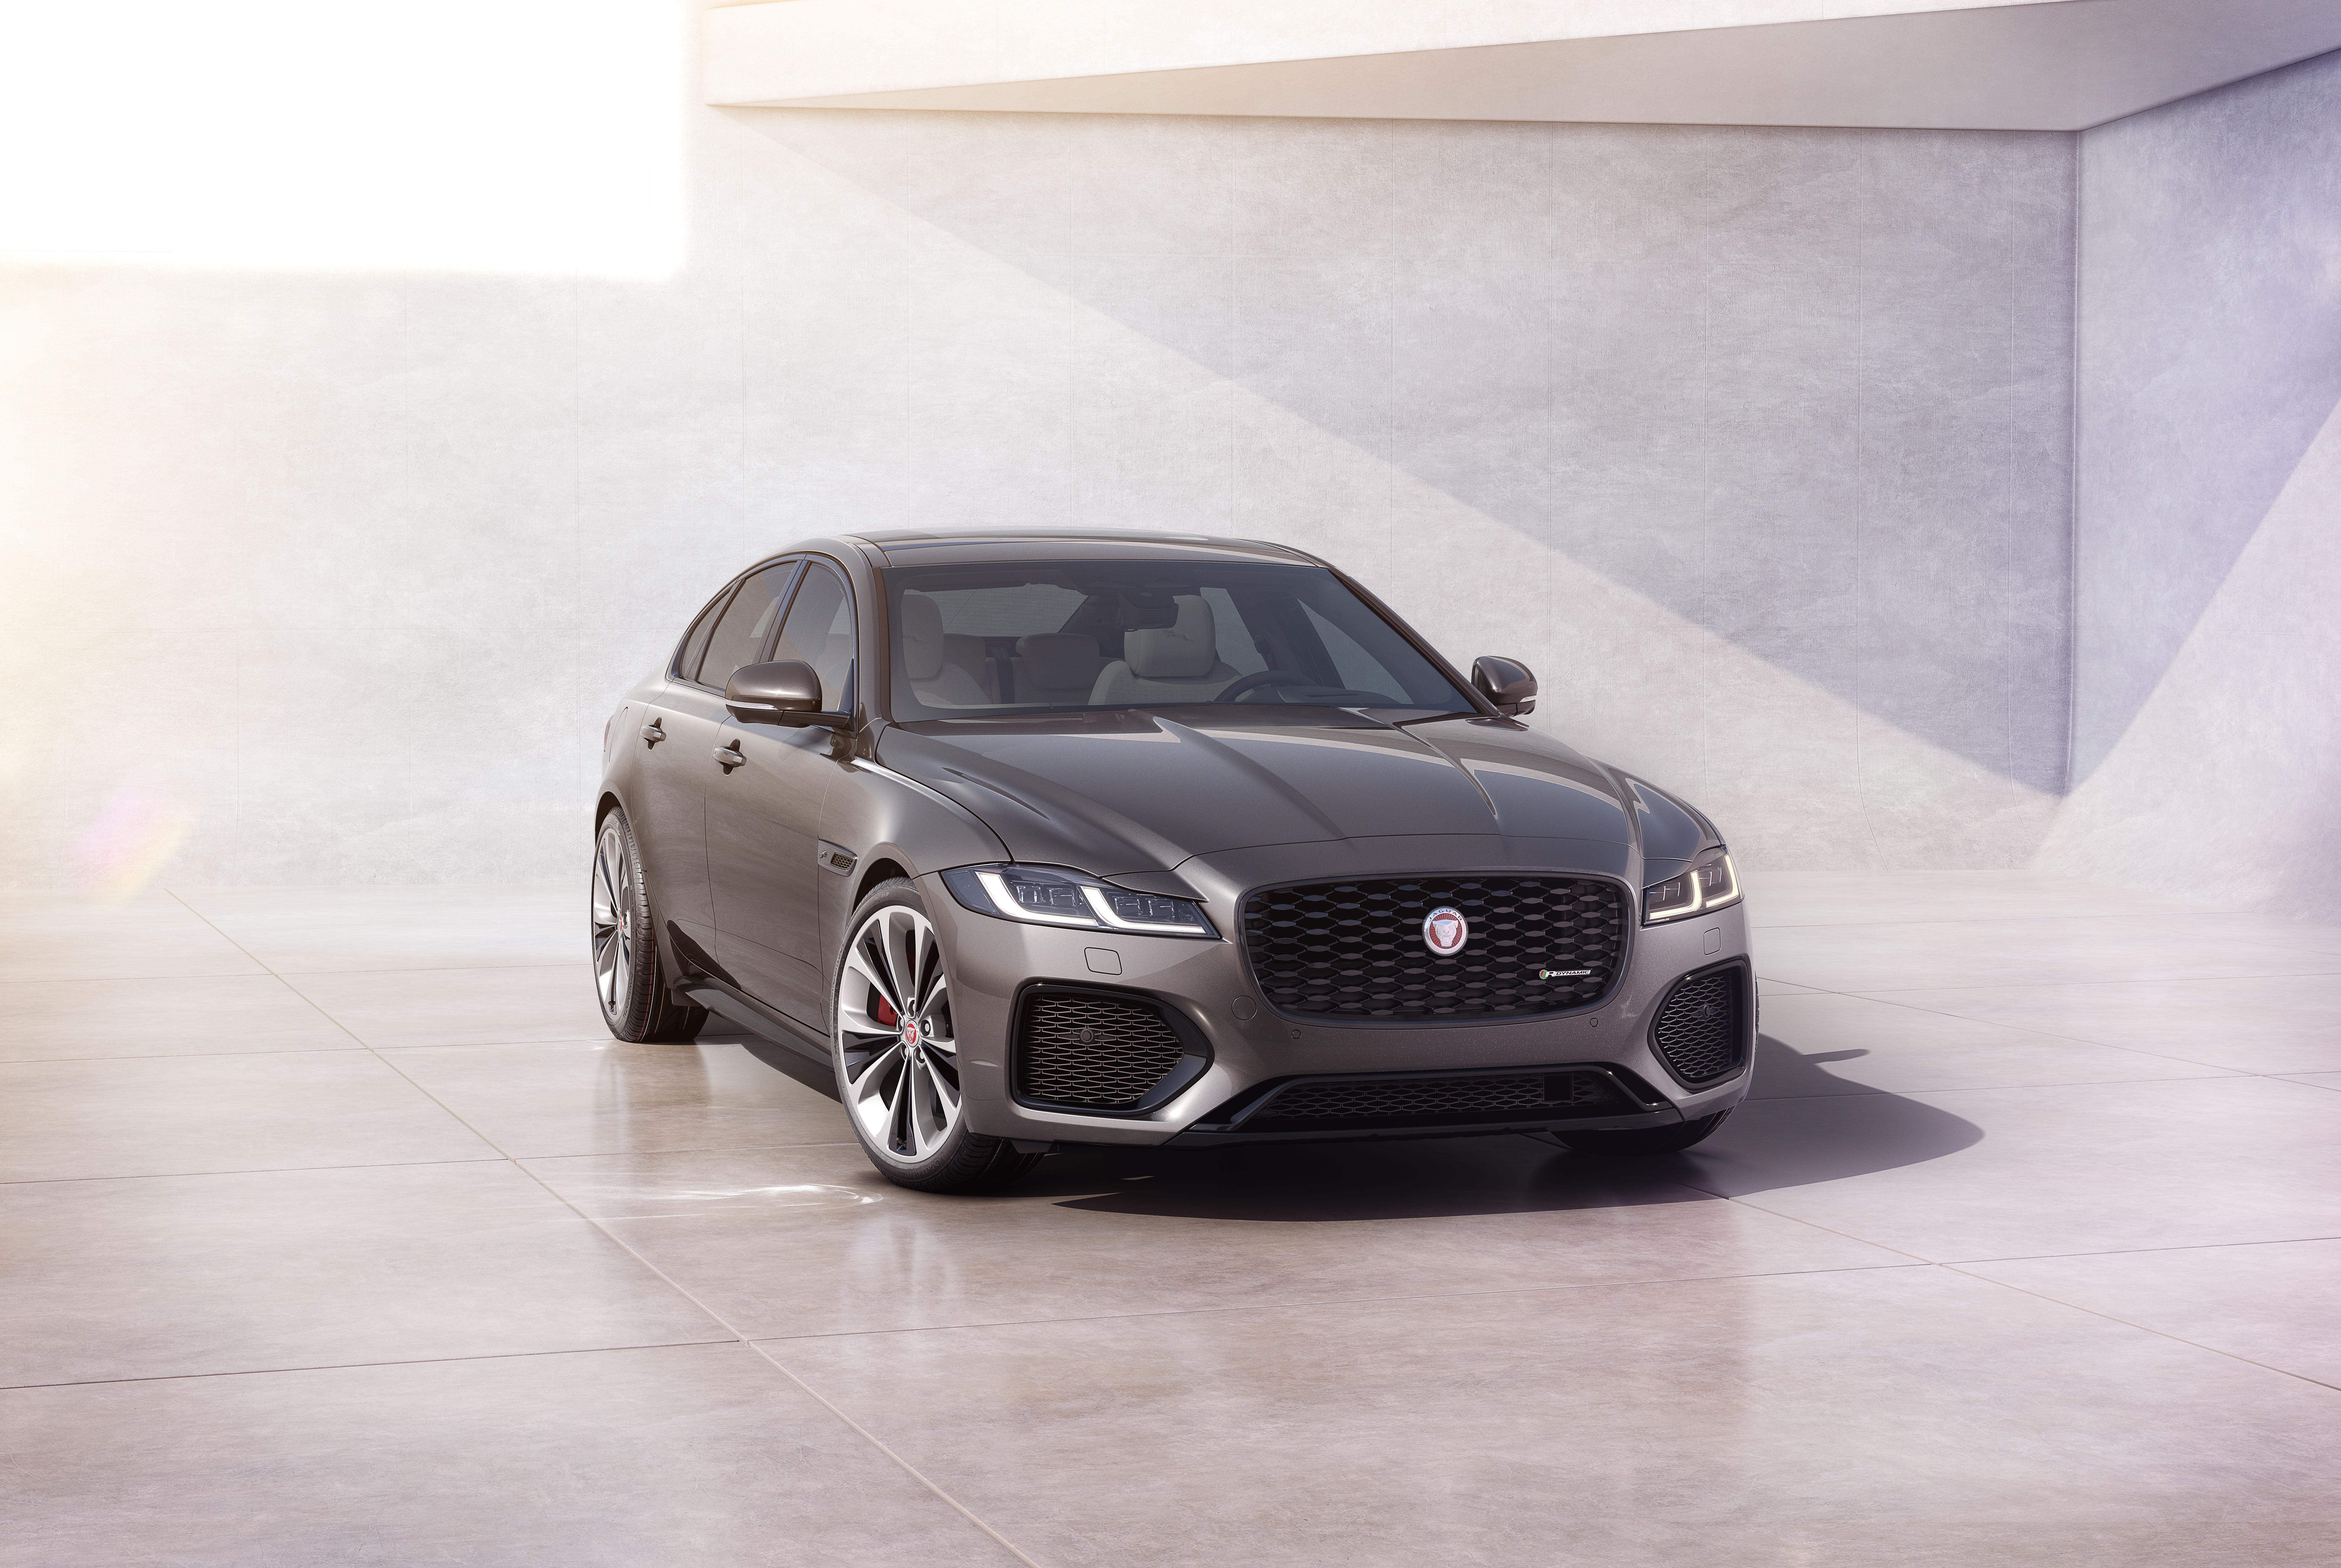 Jaguar Updates 2021 Model Lineup To Meet Evolving U S Market Demands Jaguar Homepage Usa